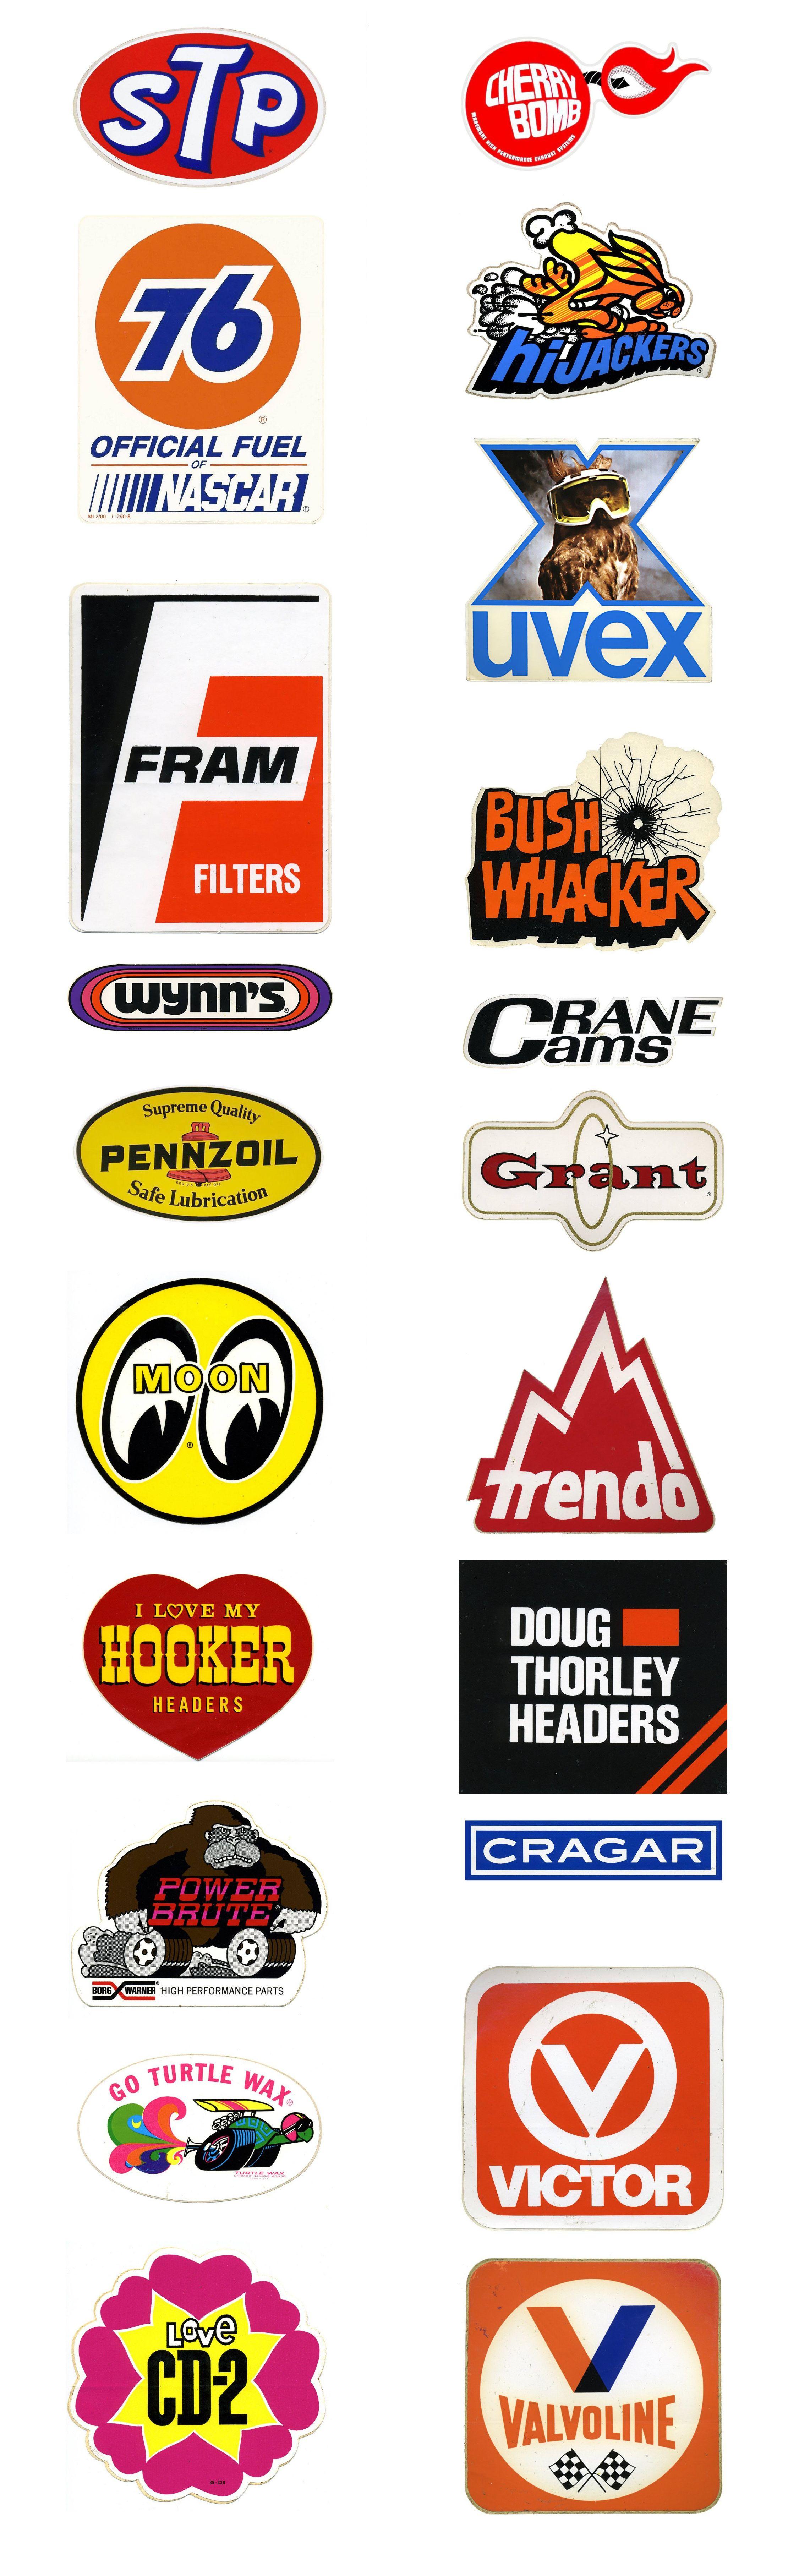 Vintage Car Racing Logos & Car Brand Decals & Stickers